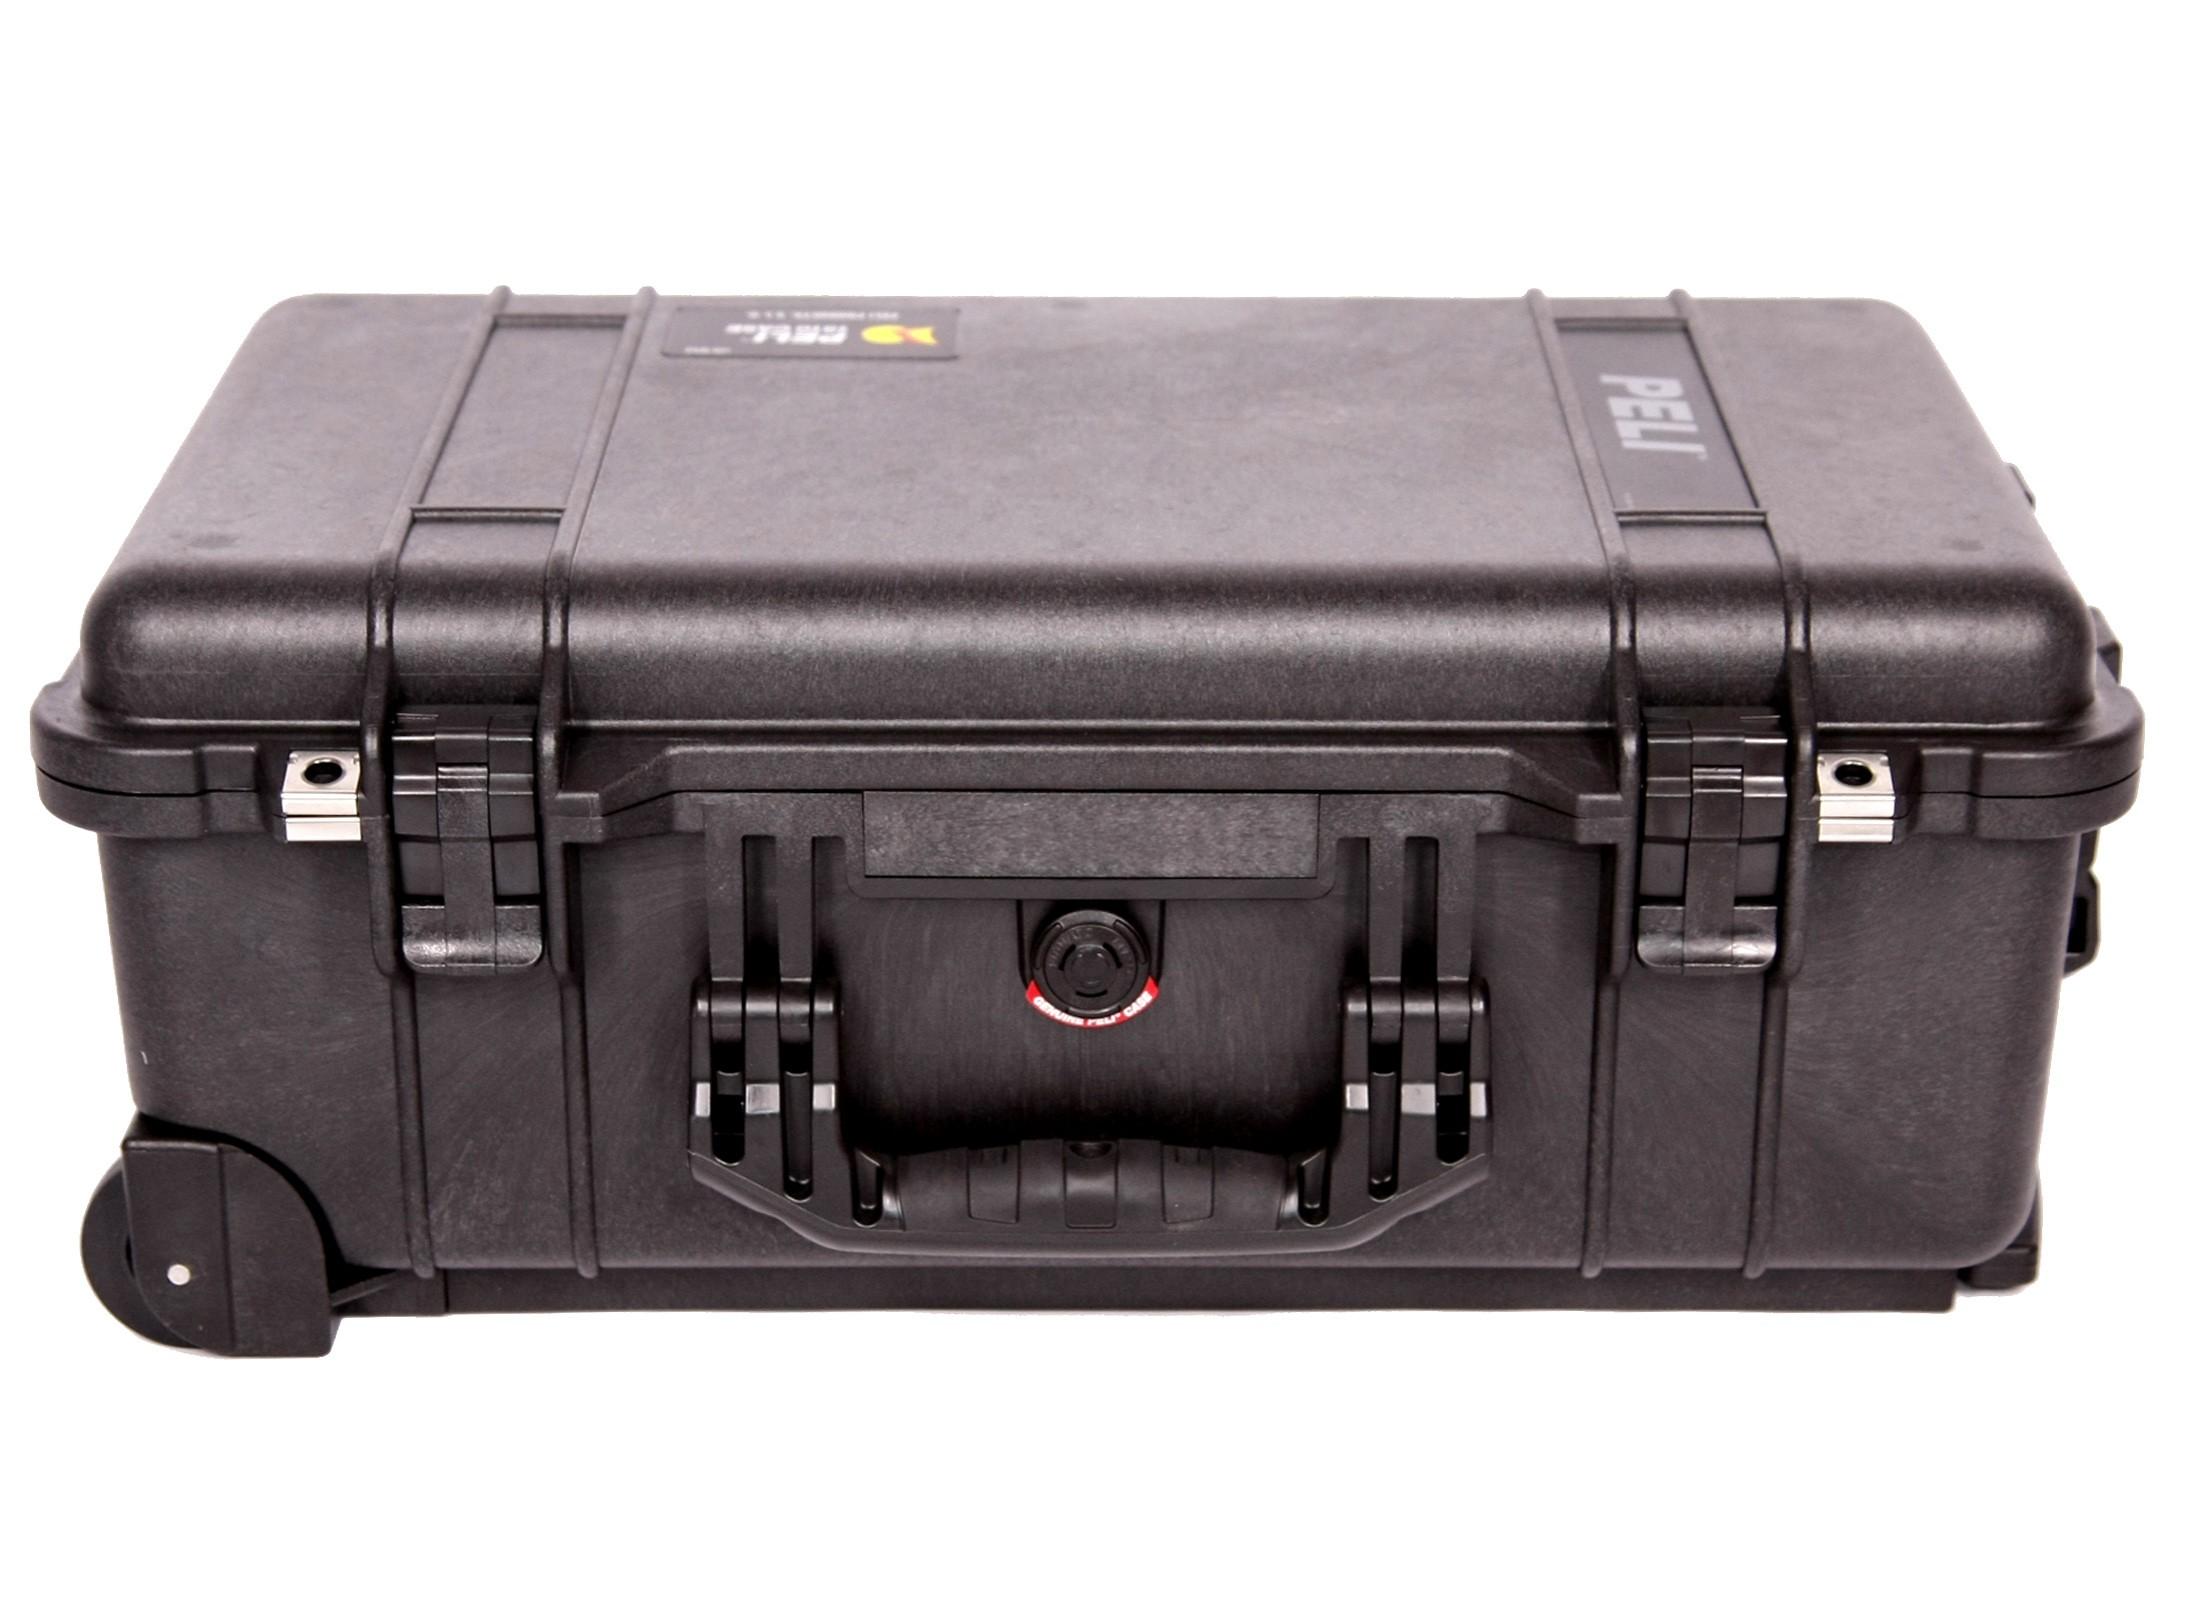 peli 1510loc laptop overnight koffer g nstig online kaufen bei huss licht ton. Black Bedroom Furniture Sets. Home Design Ideas